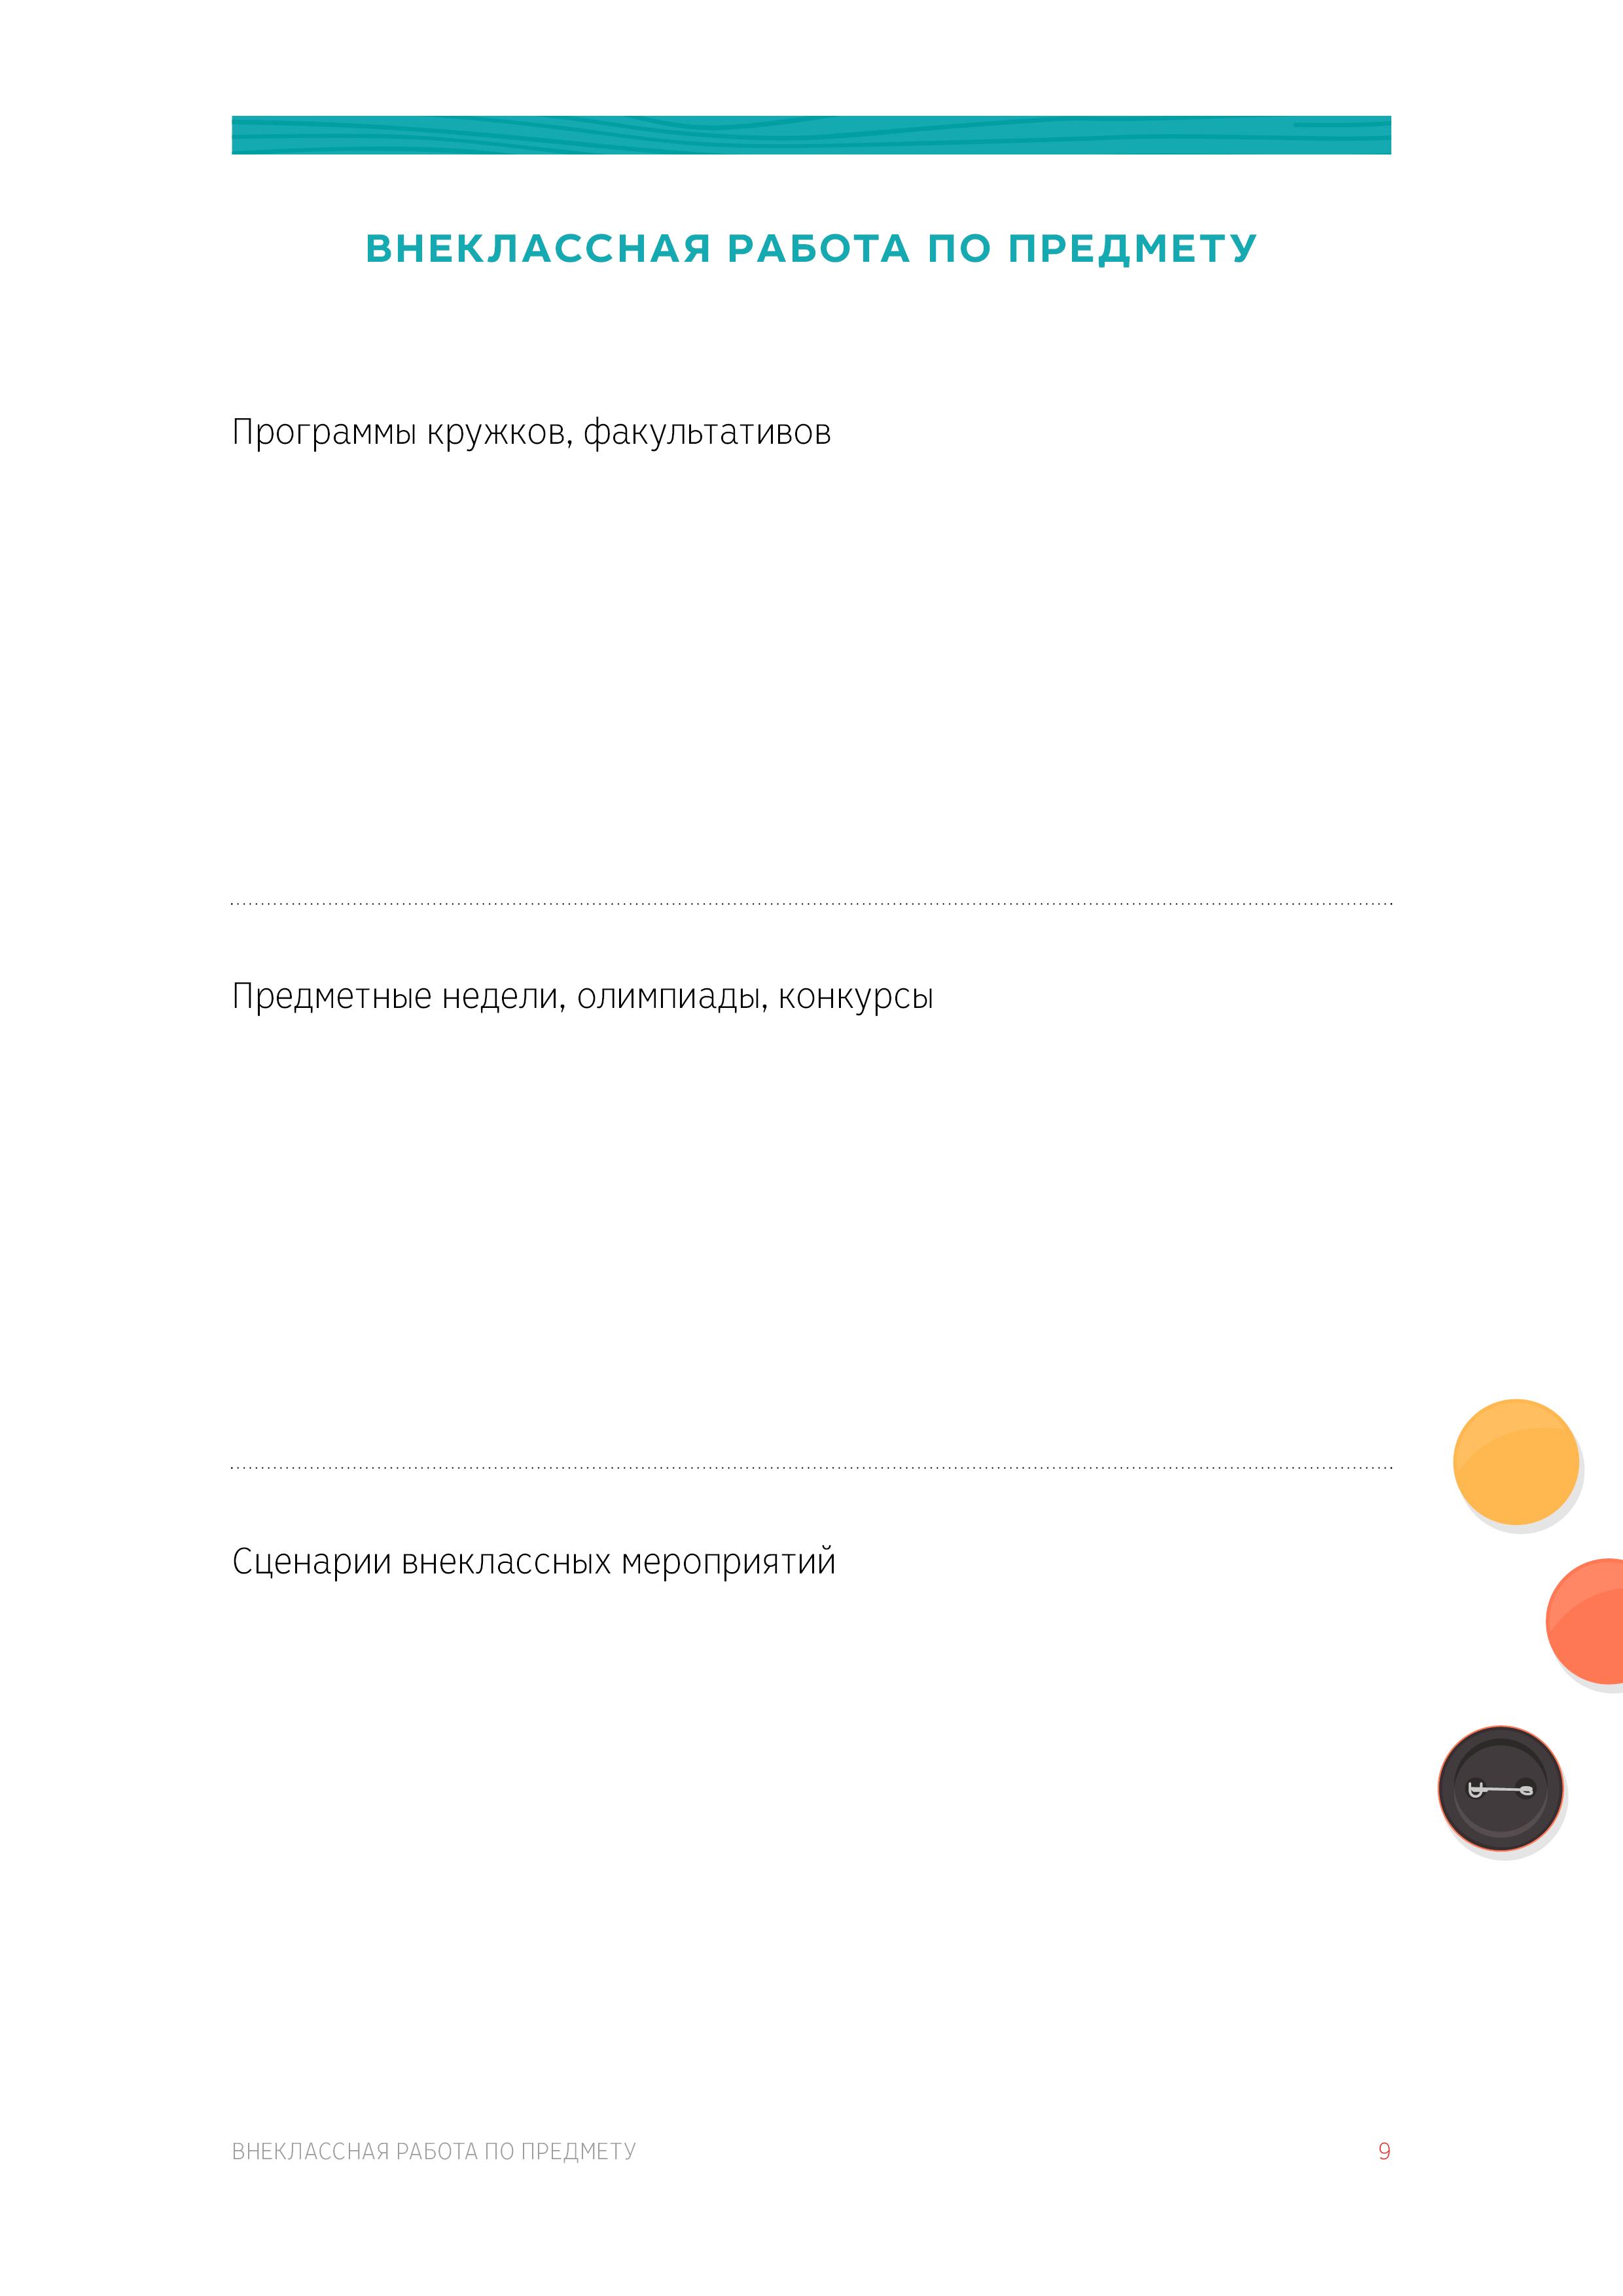 D:\projects\Александр\Олимпиады\Май2015\Портфель учителя\!send\my_portfolio1_38.png